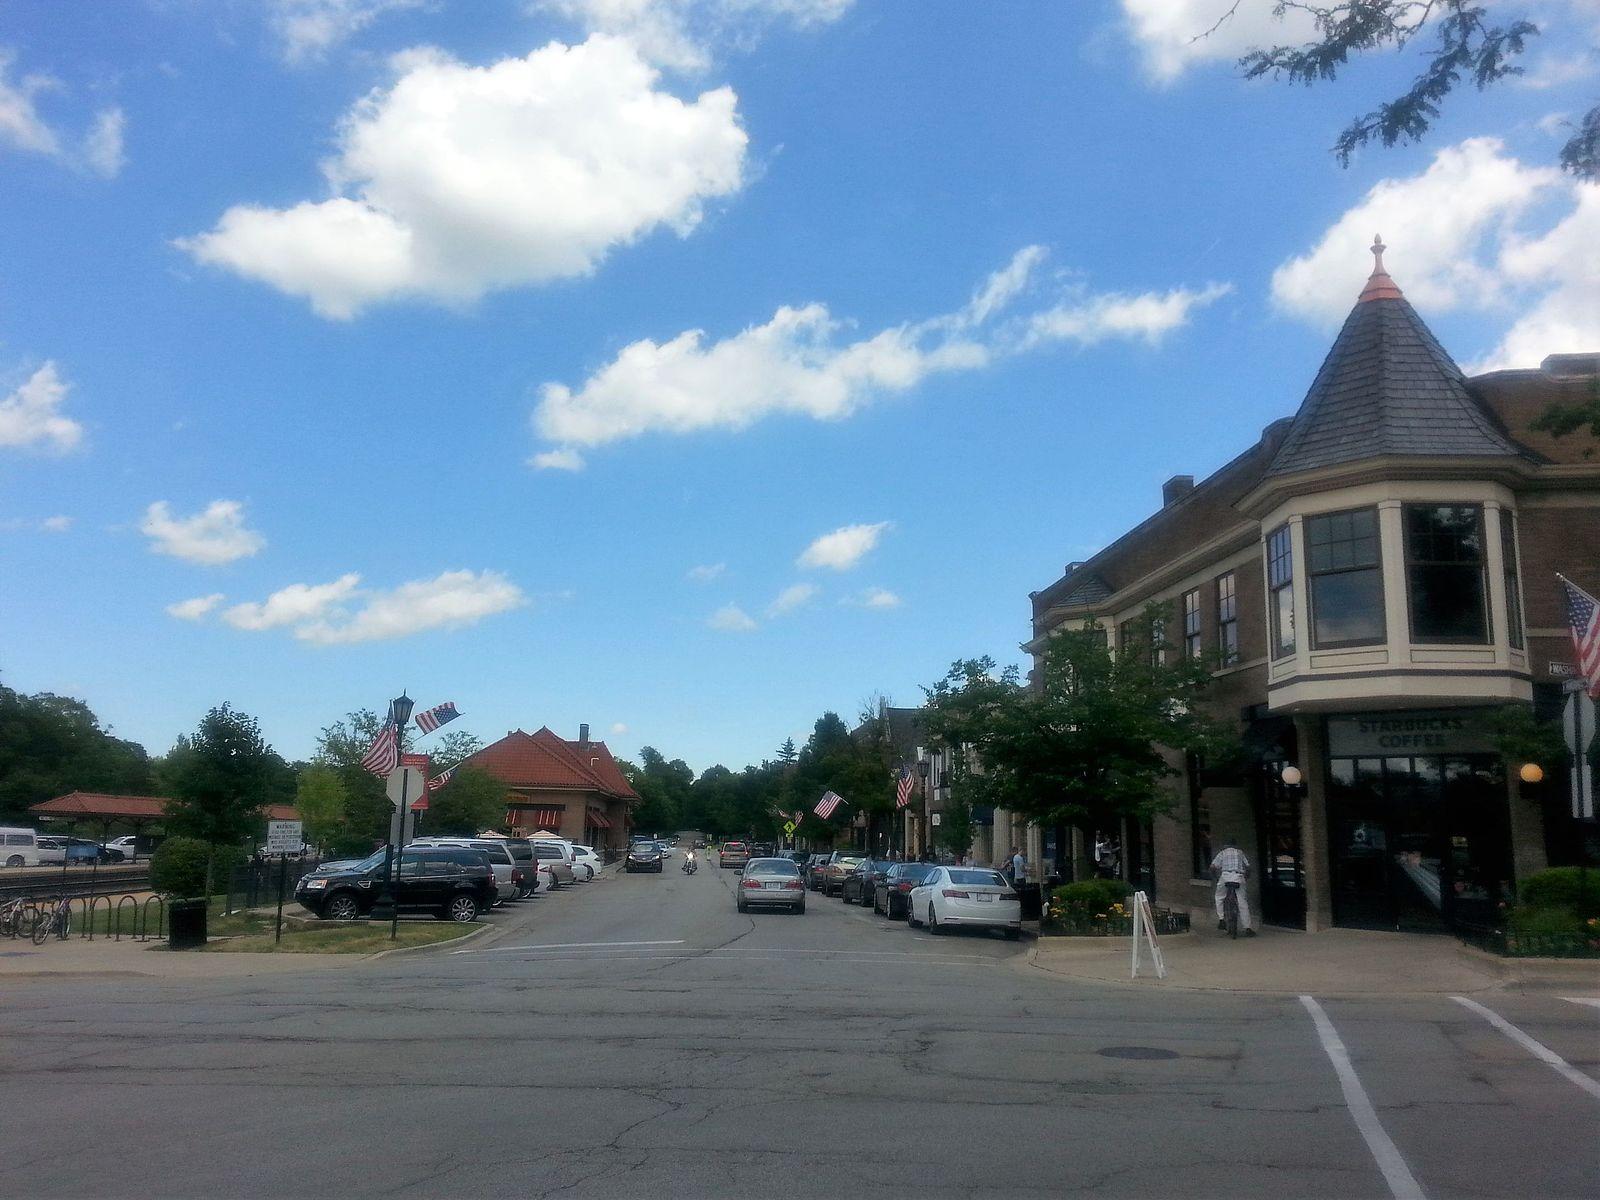 Downtown_Hinsdale_Illinois